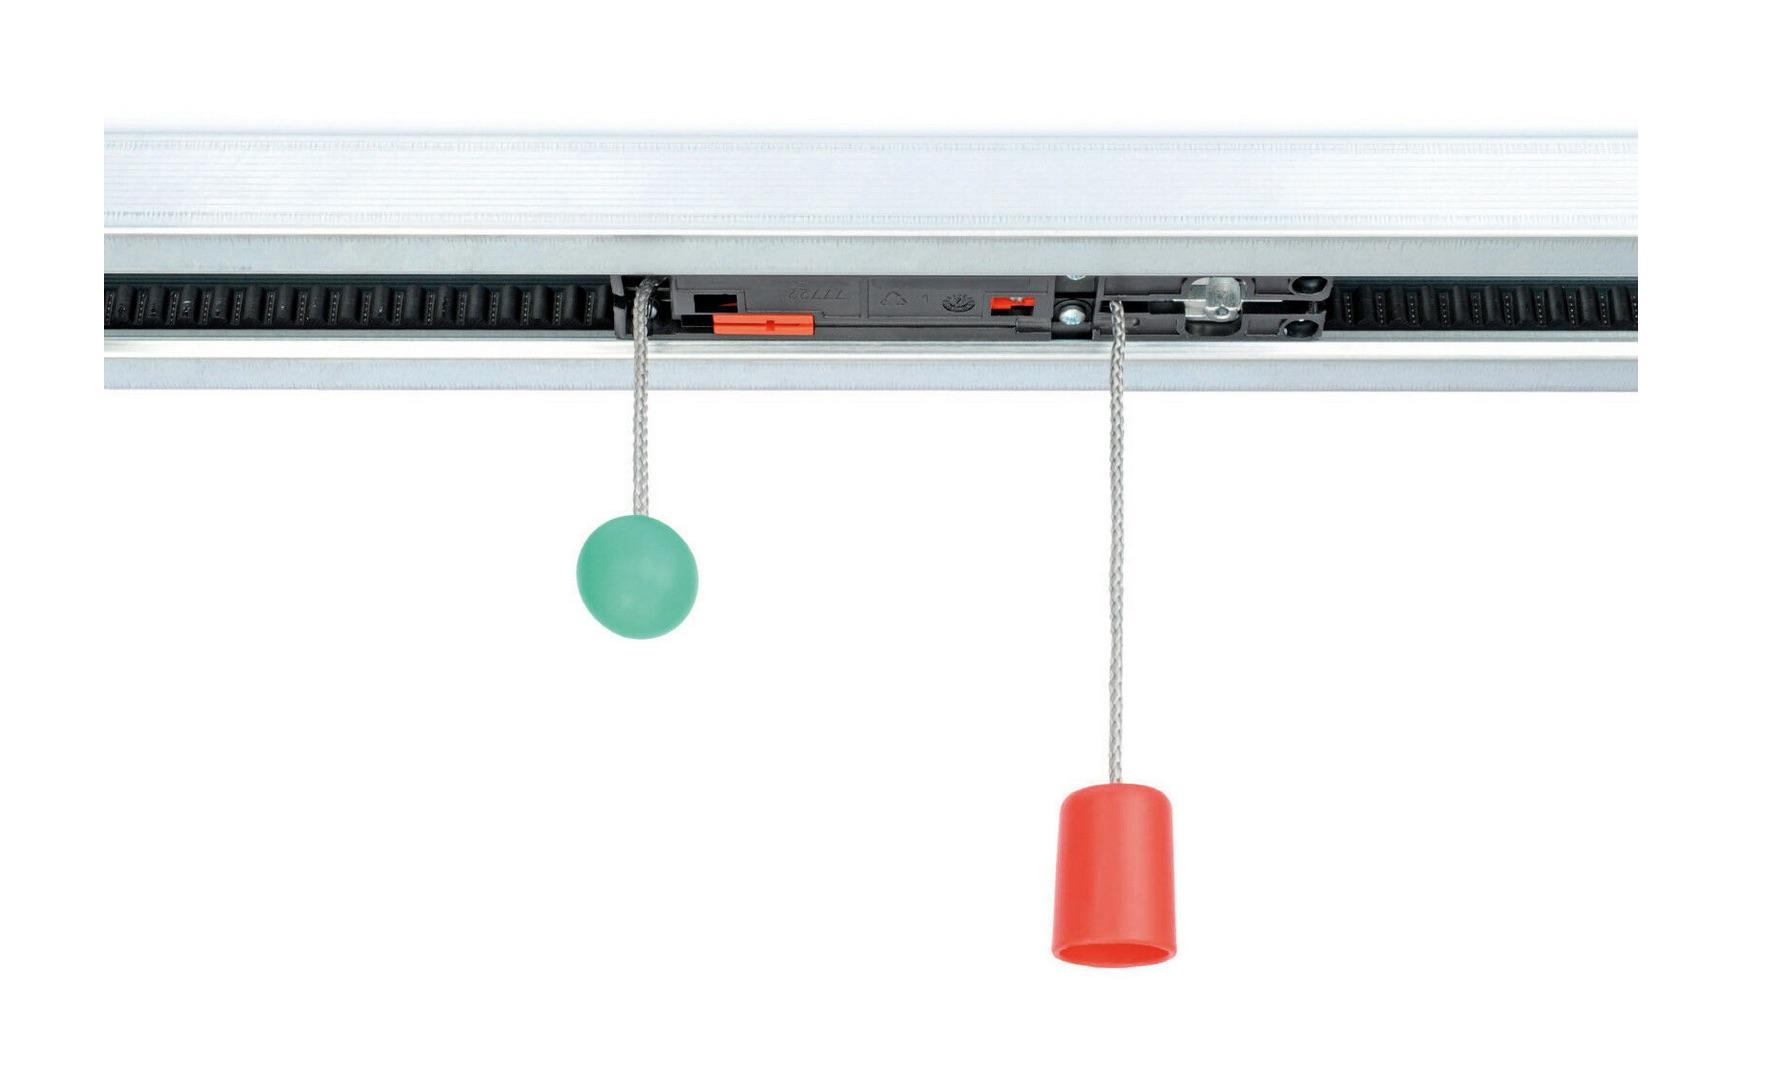 Marantec SZ11 Operator Remote Standard Belt Drive - Rail Only